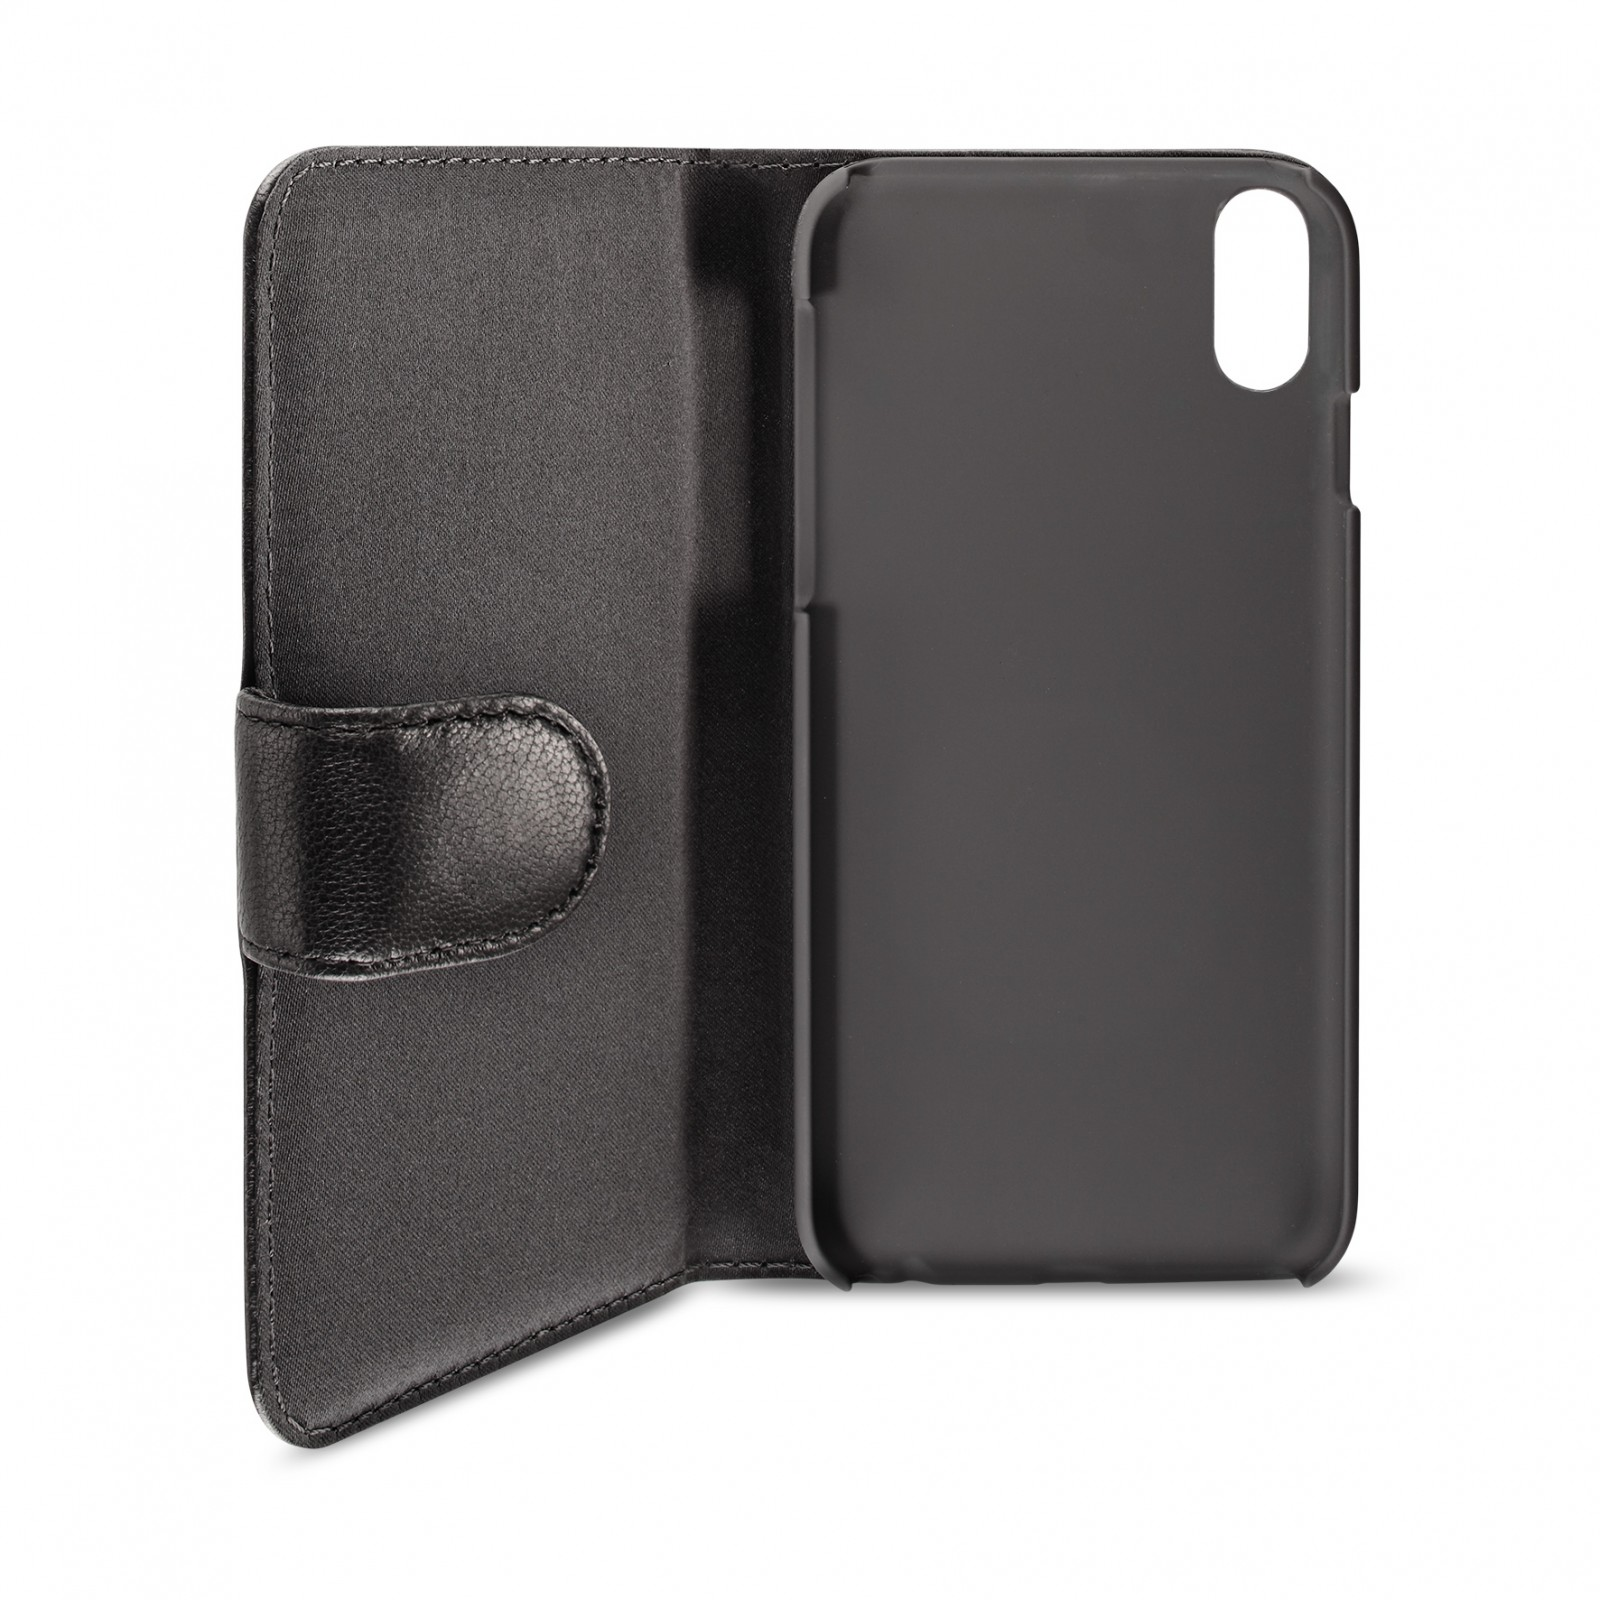 Artwizz Seejacket Leather Iphone